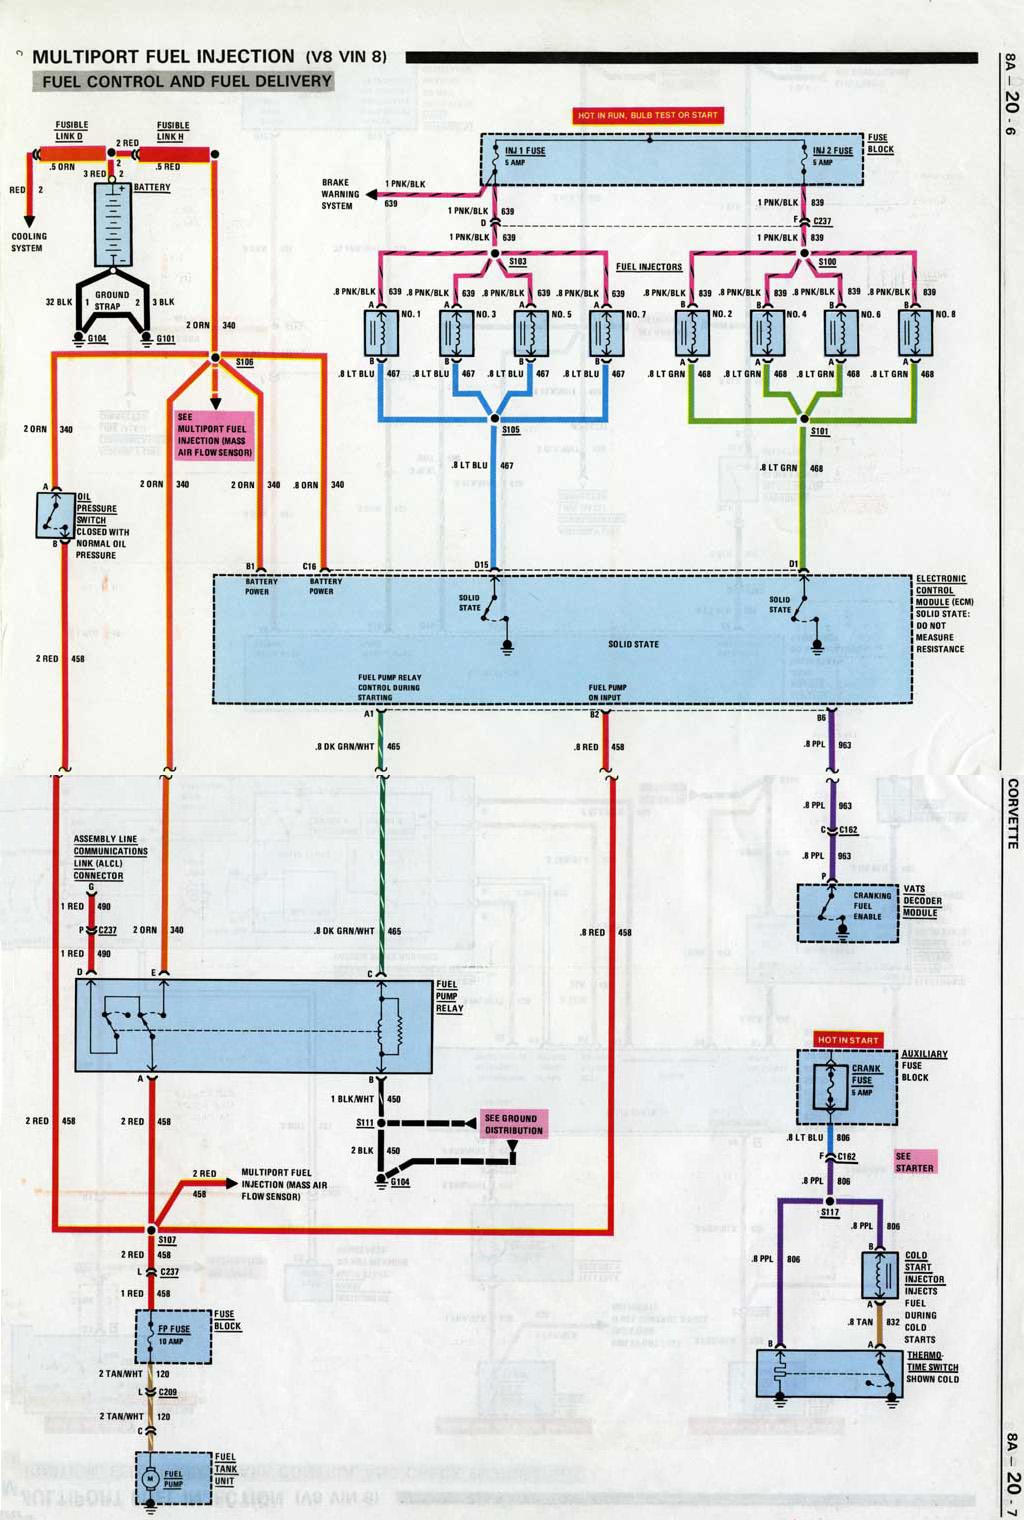 1985 corvette wiring diagram casablanca fan motor 86 aldl problem forum digitalcorvettes